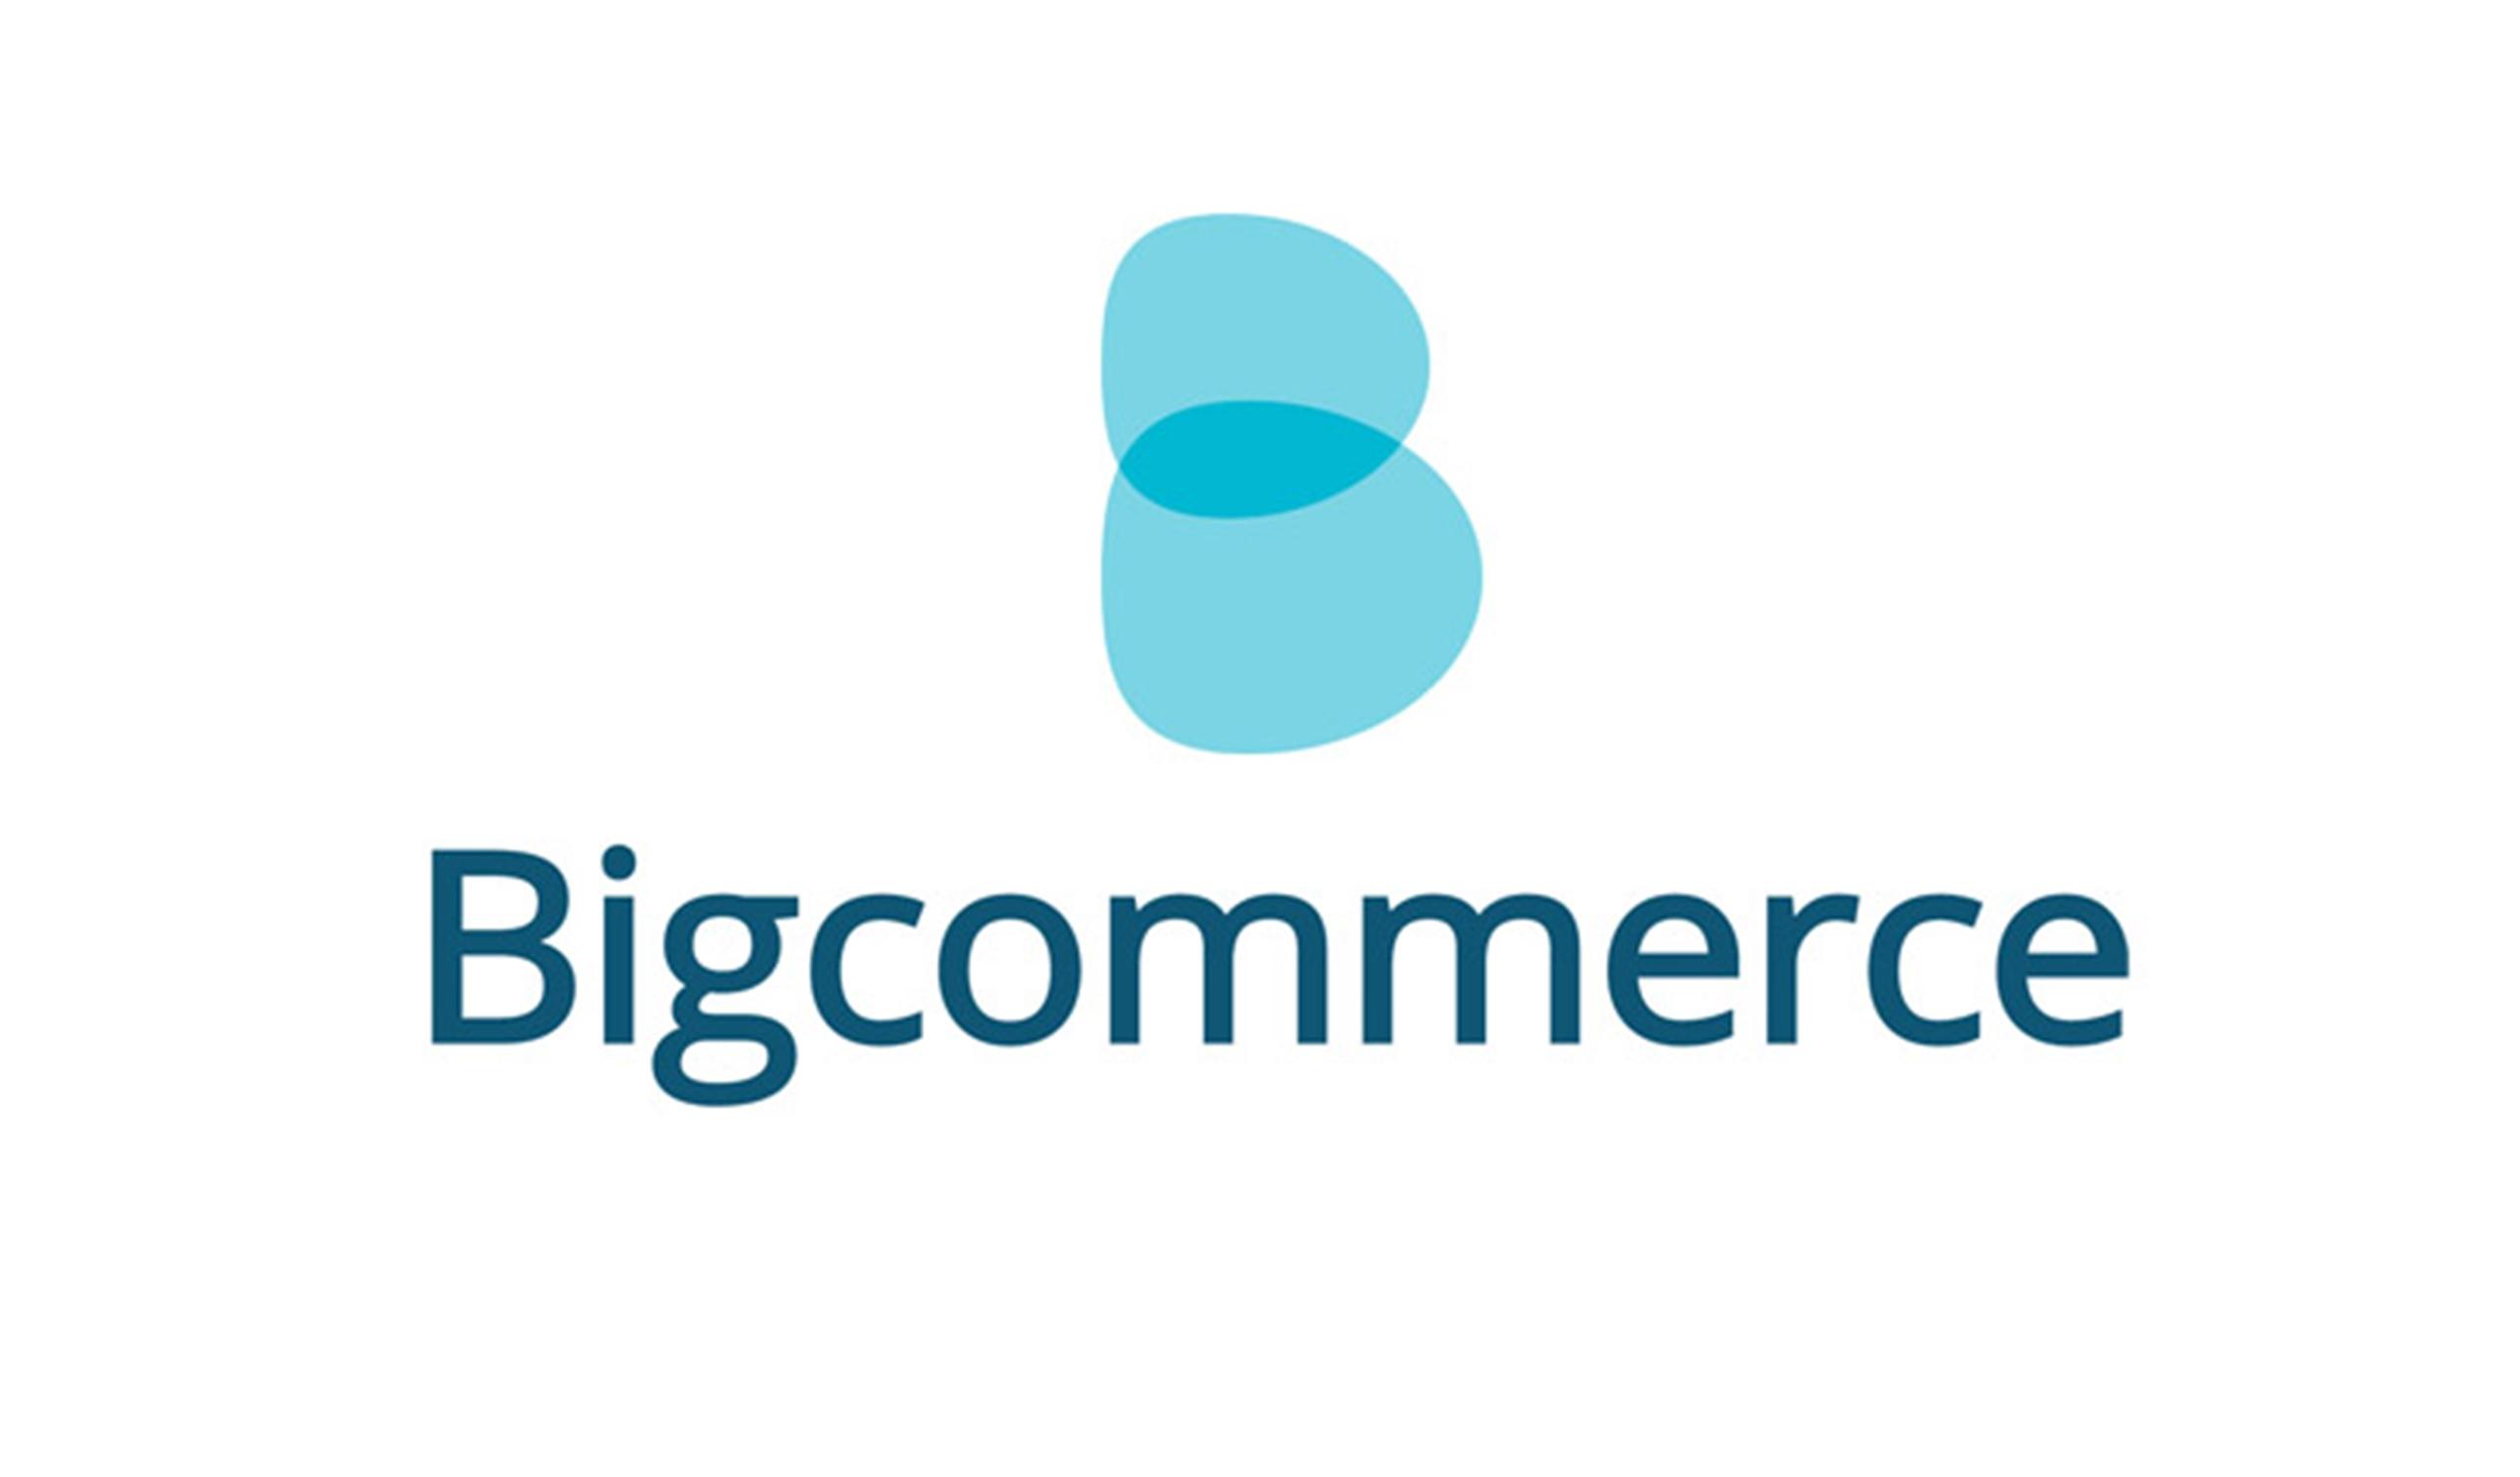 cuckhoo-web-design-digital-marketing-industry-skills-Bigcommerce